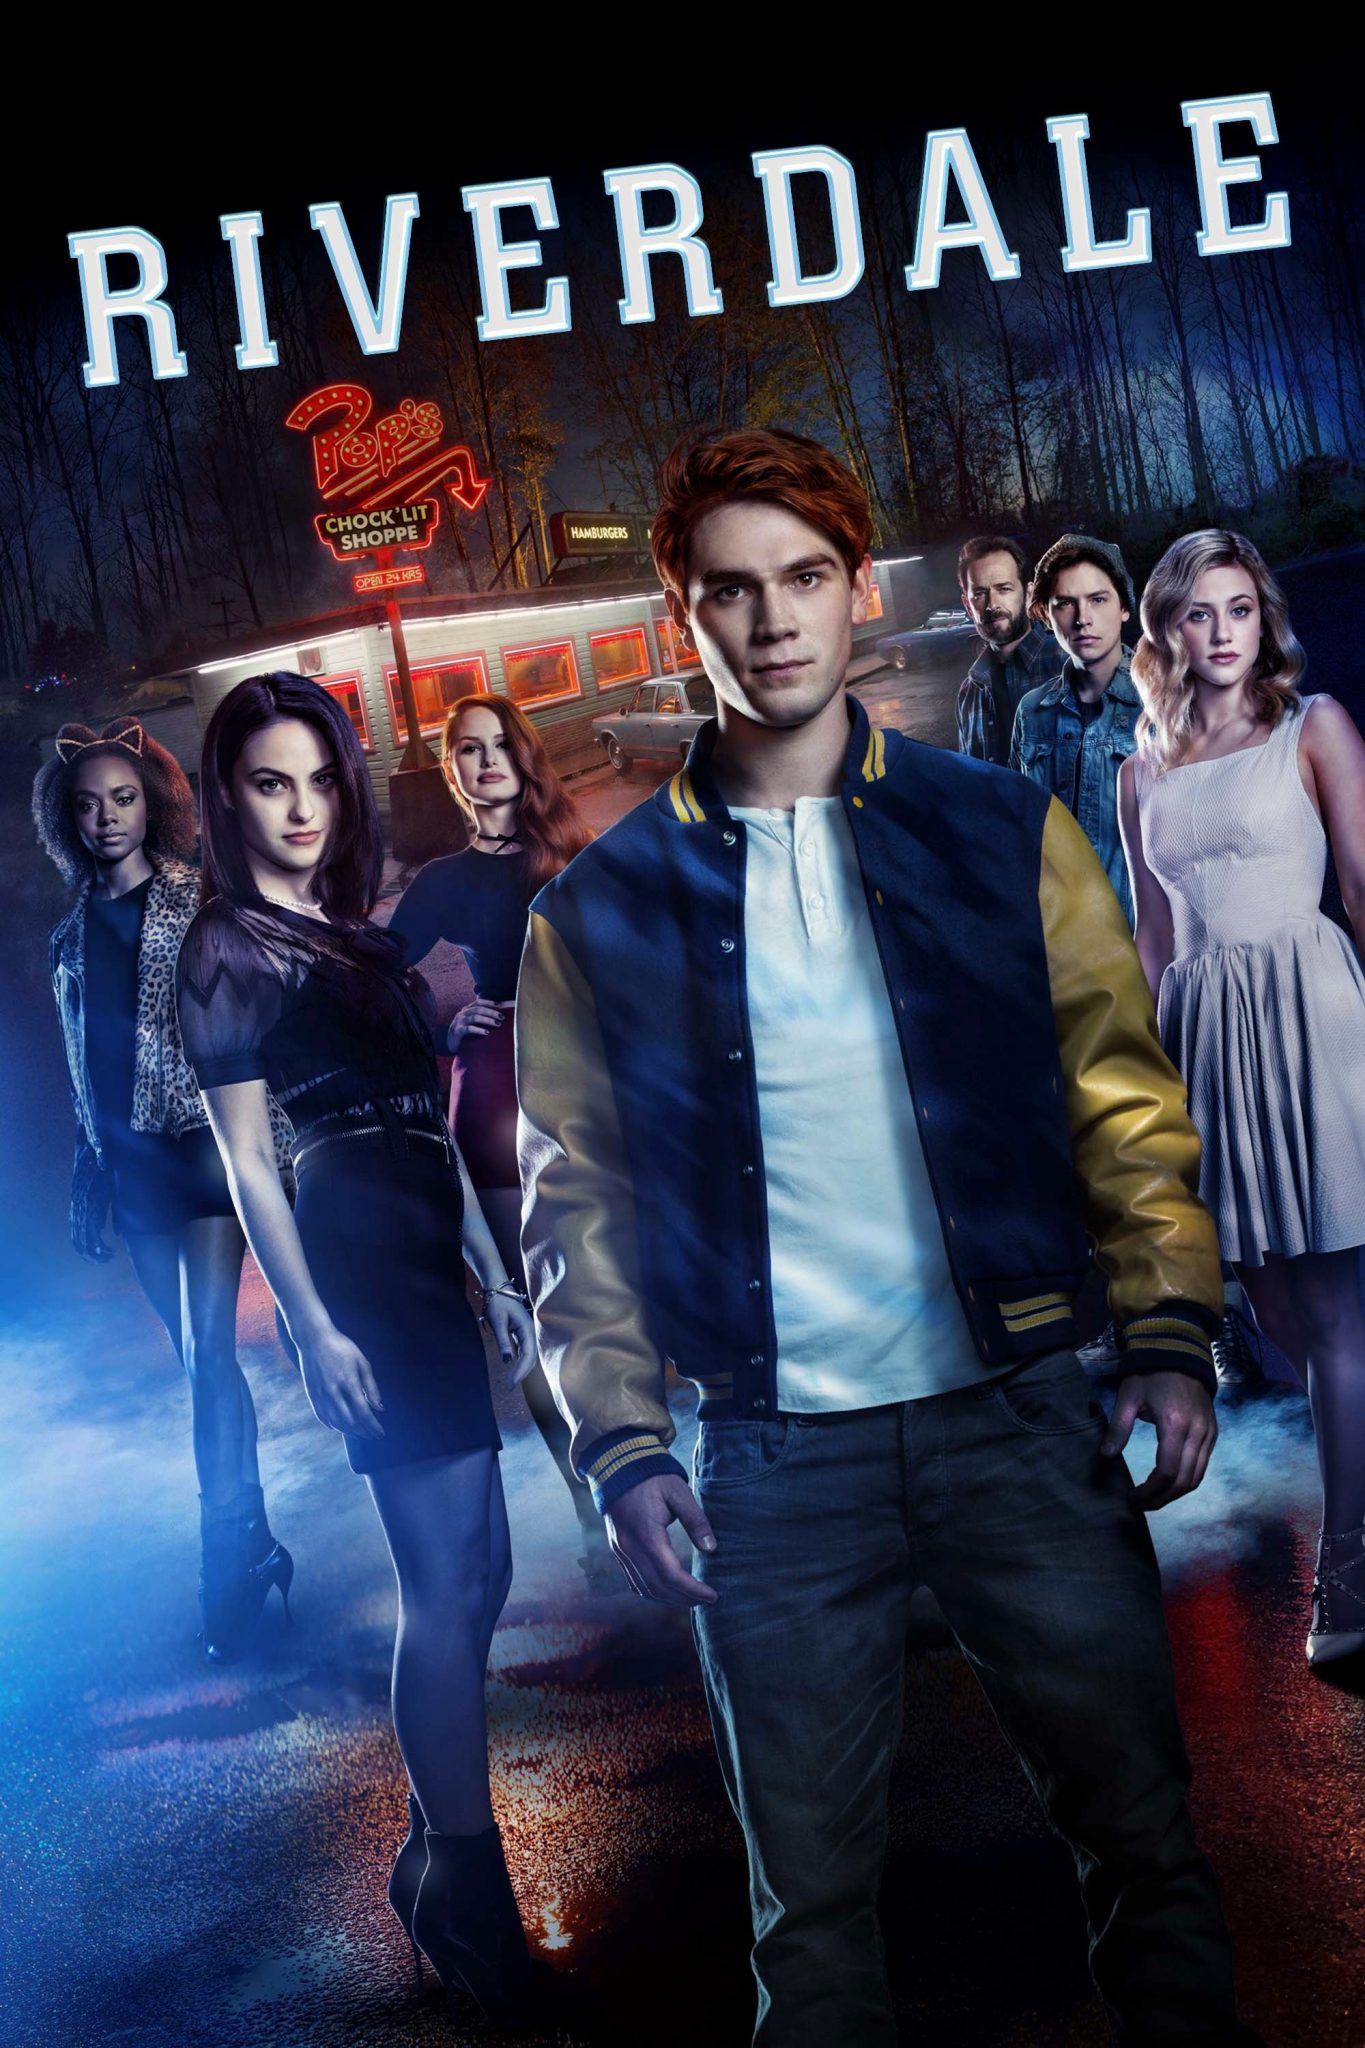 Riverdale, πέμπτος κύκλος